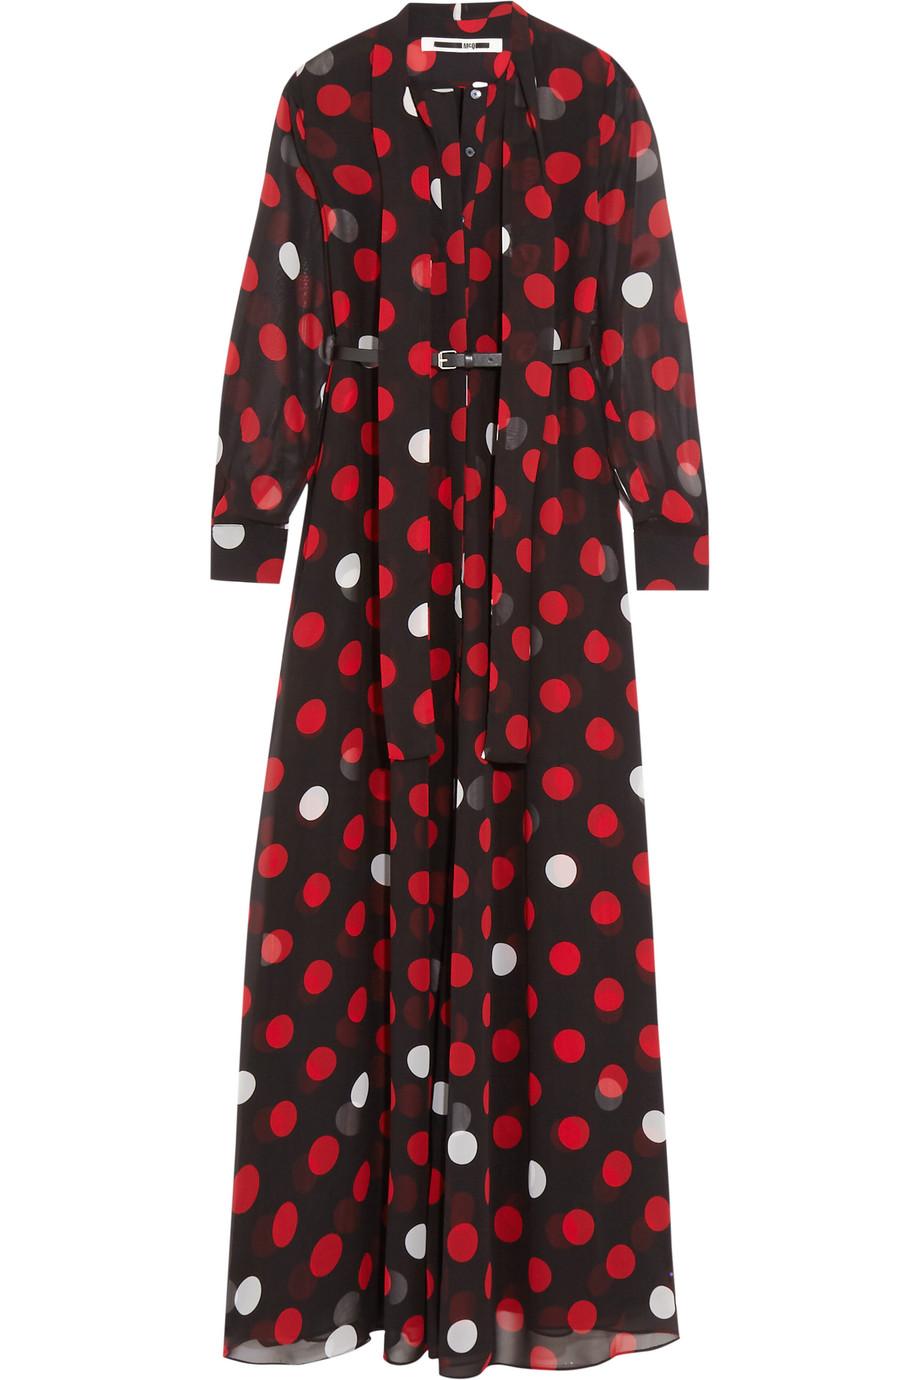 Pussy-Bow Polka-Dot Chiffon Maxi Dress, Mcq Alexander Mcqueen, Black/Red, Women's - Polka dots, Size: 36